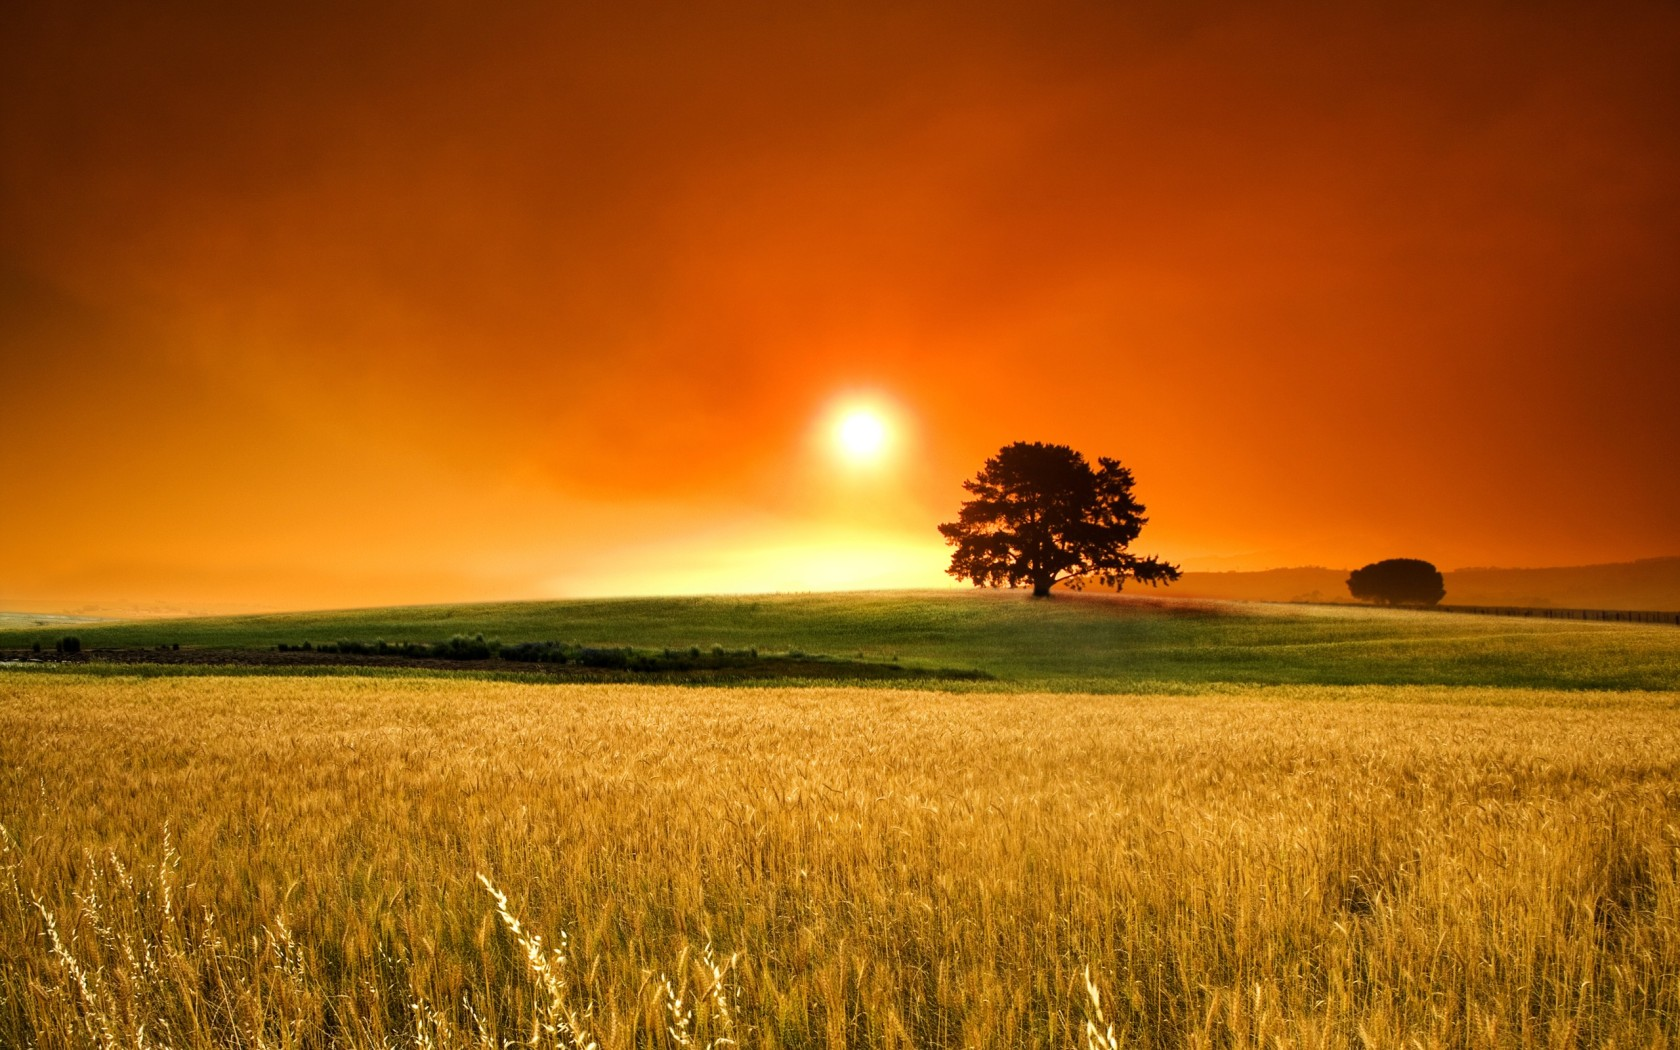 ... Country Sunset Wallpaper · Country Sunset Wallpaper